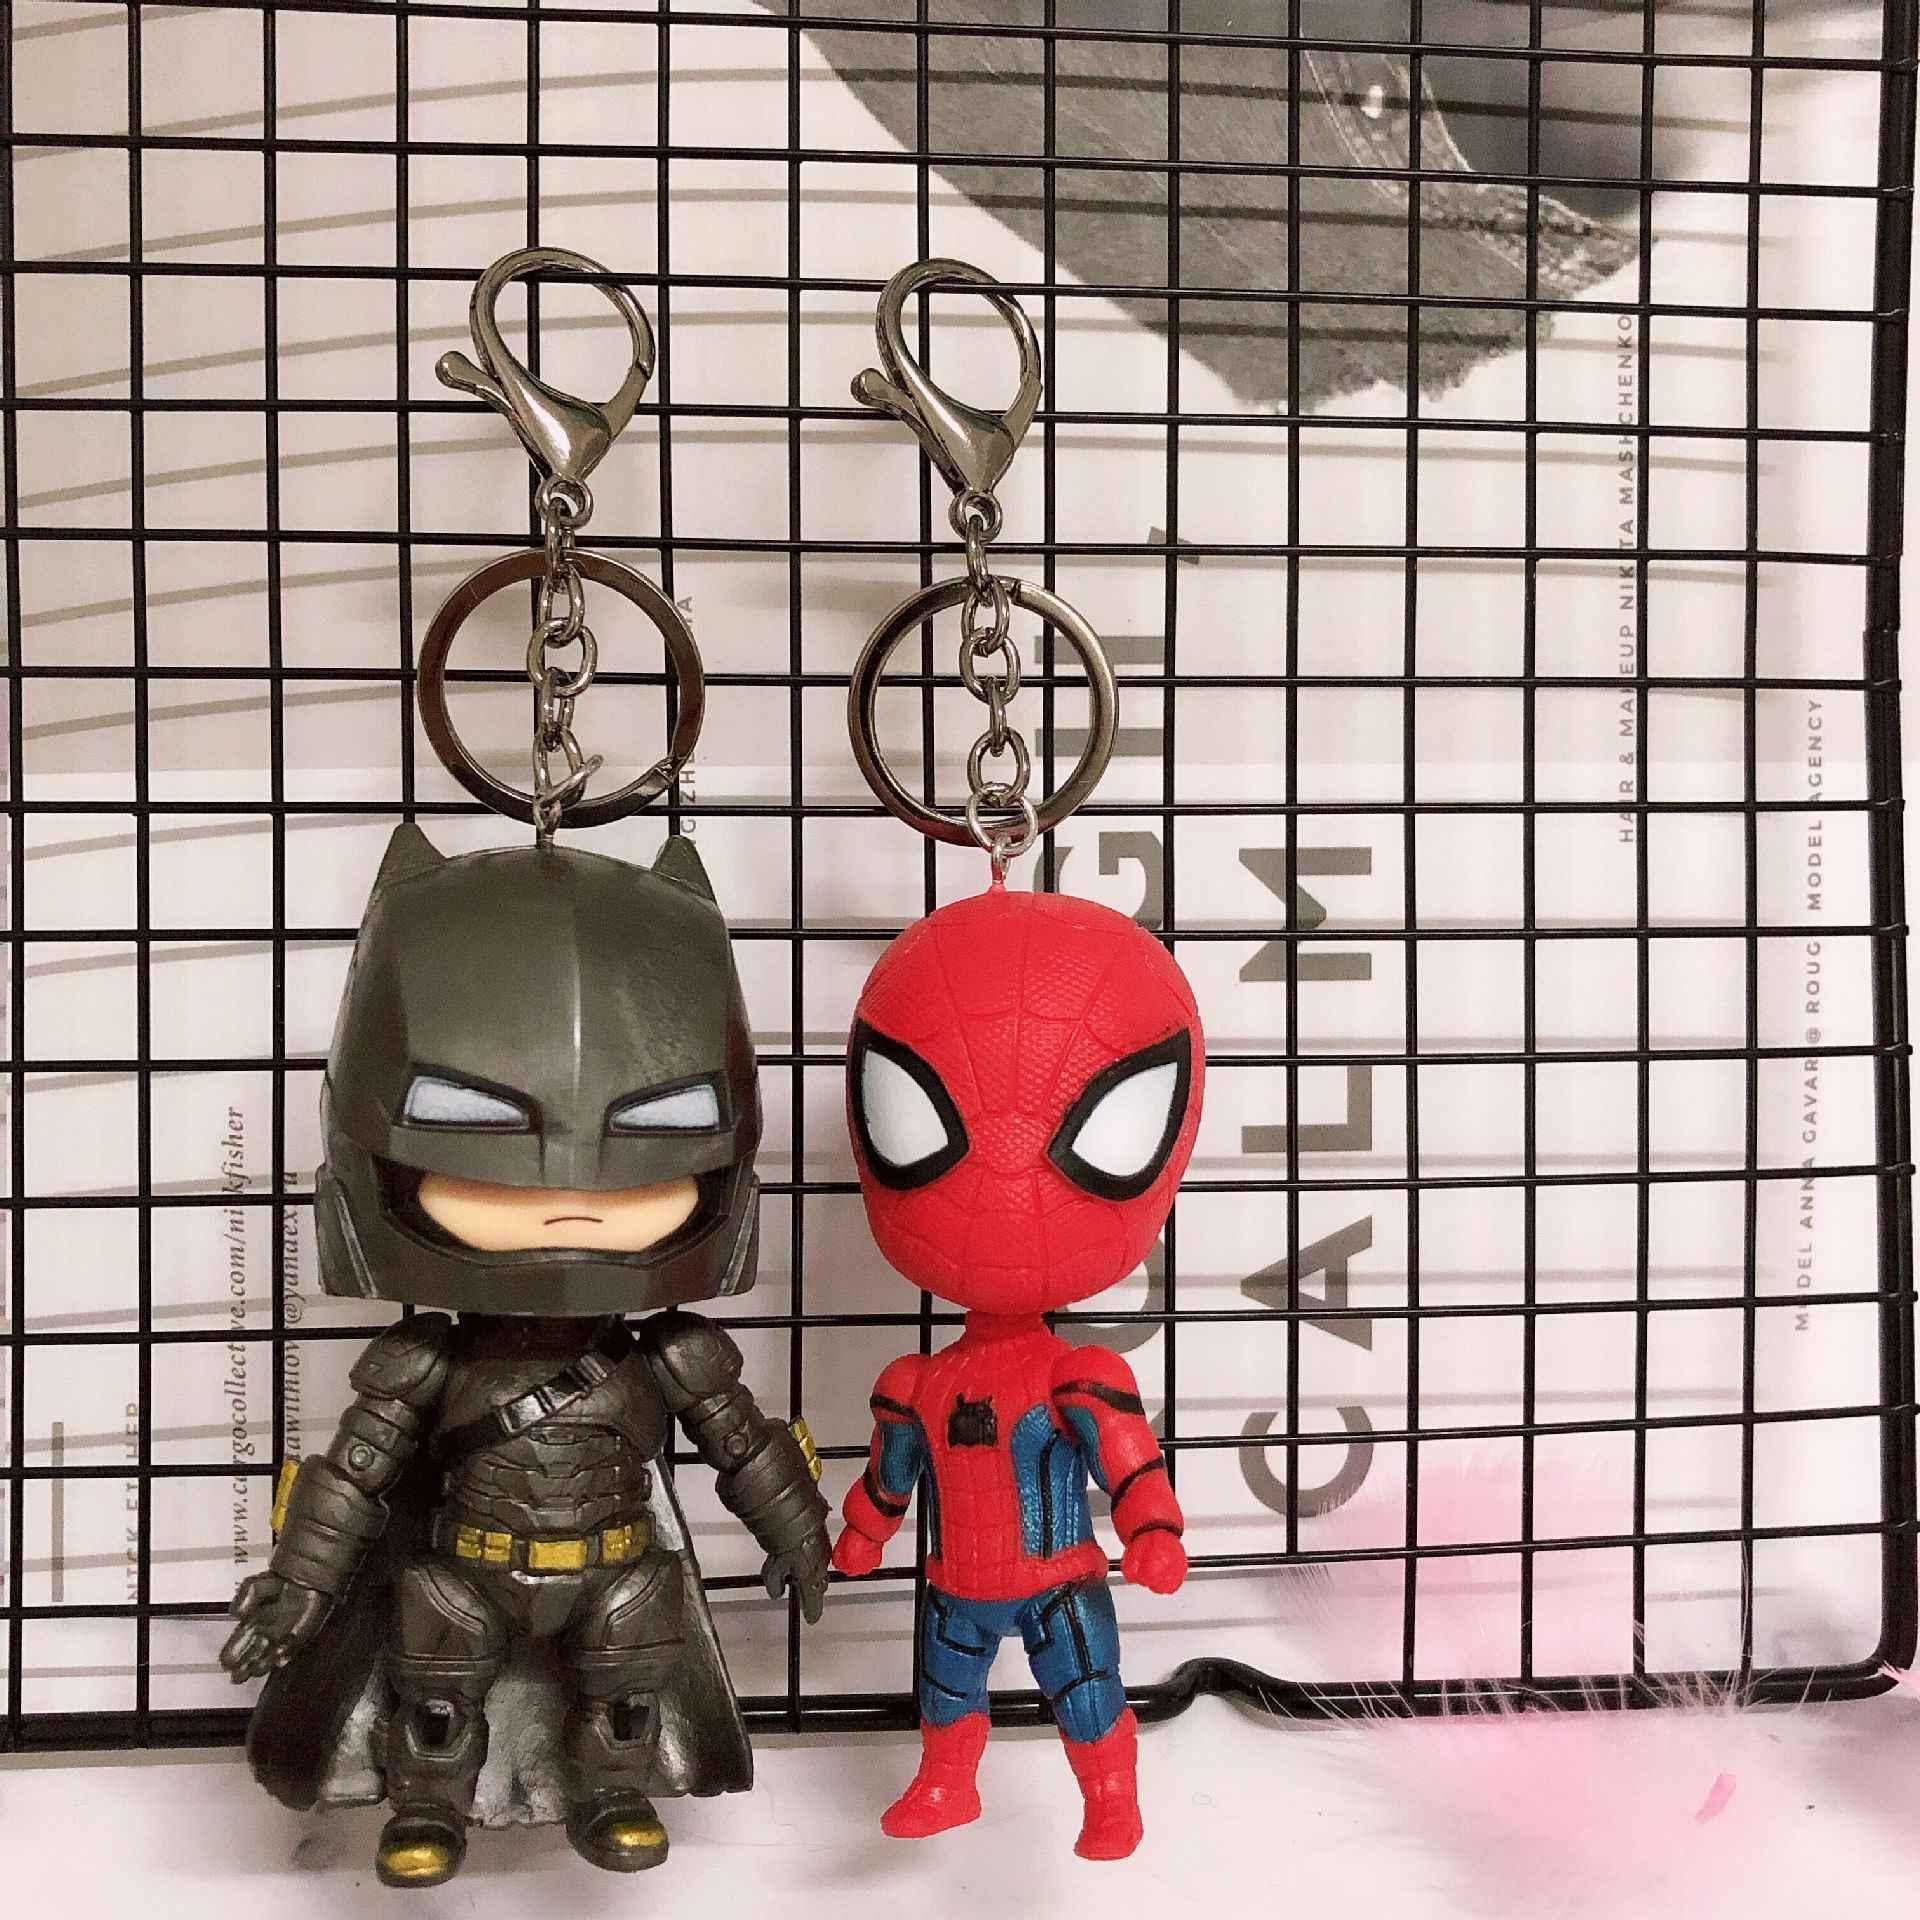 2019 quente funko pop original dragon ball superman vingadores spiderman batman esquadrão suicida figura boneca collectible modelo chaveiro